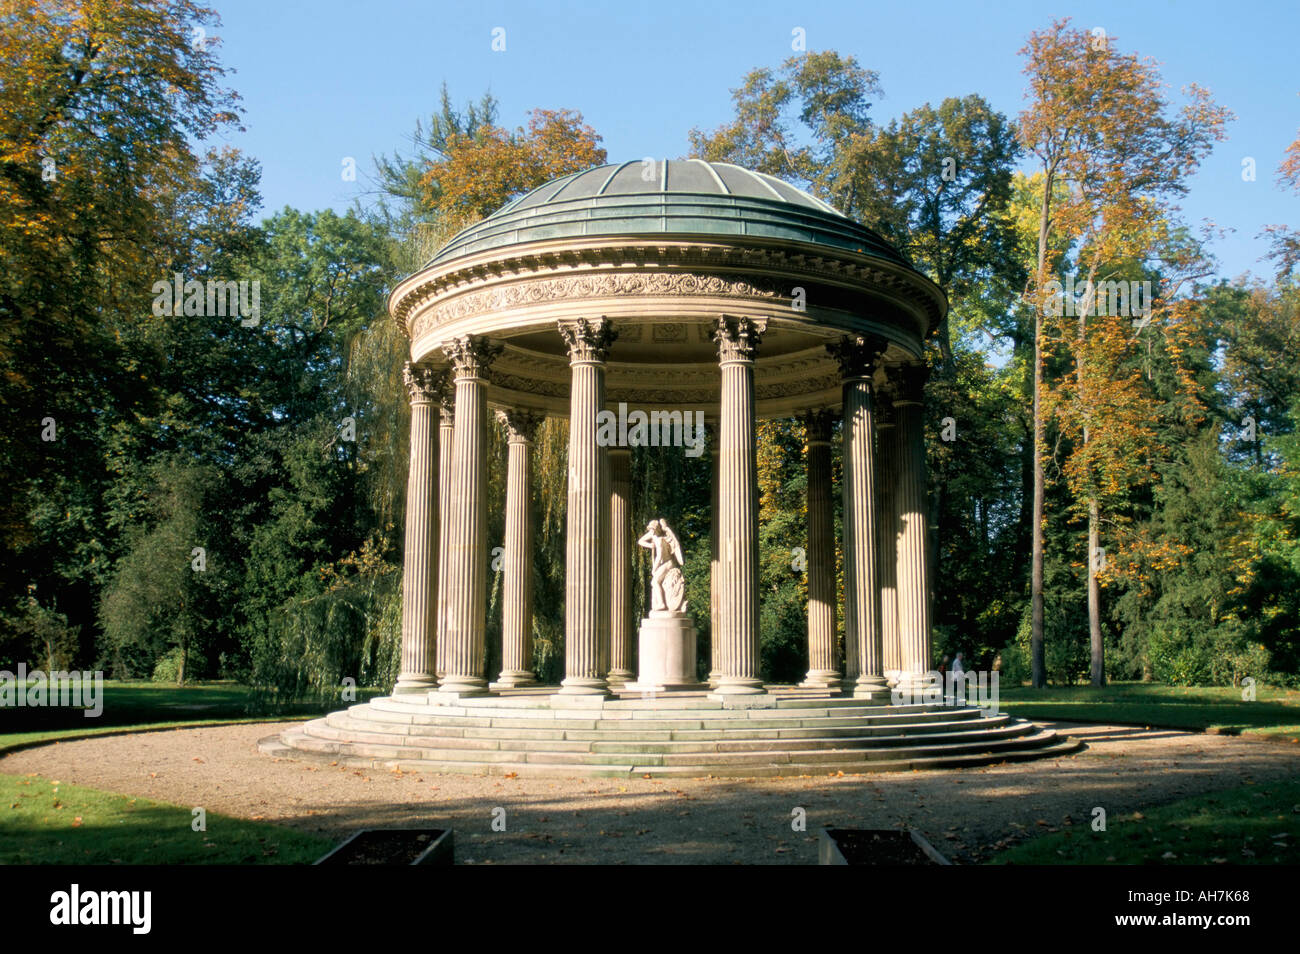 Temple de l Amour Temple of Love Chateau of Versailles UNESCO World Heritage Site Les Yvelines France Europe - Stock Image